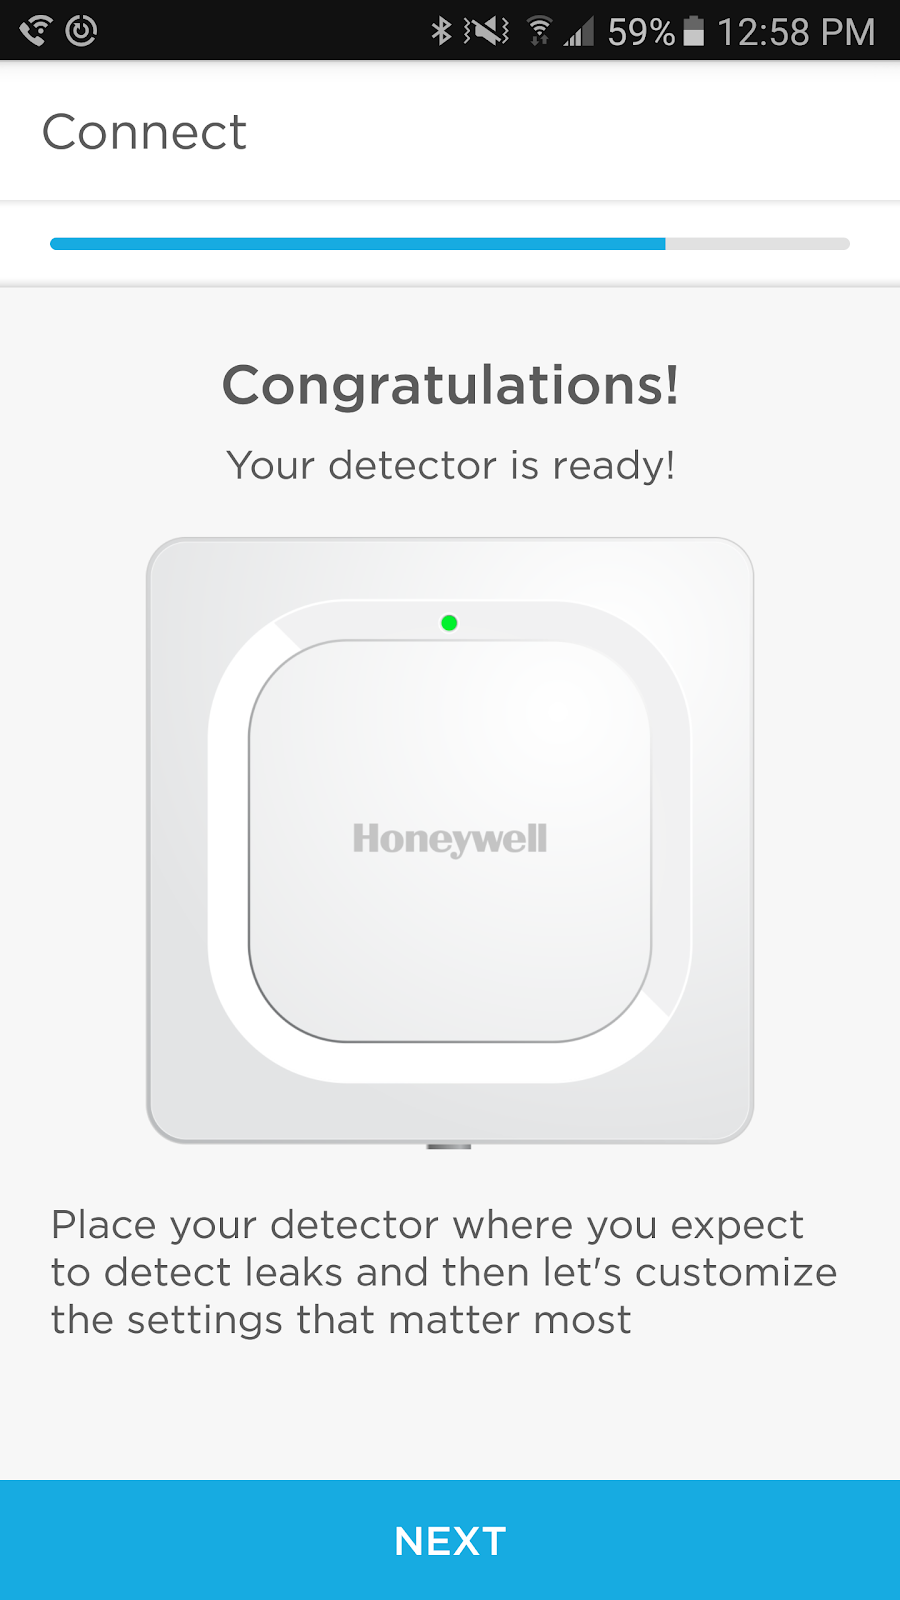 Honeywell-congrats.png